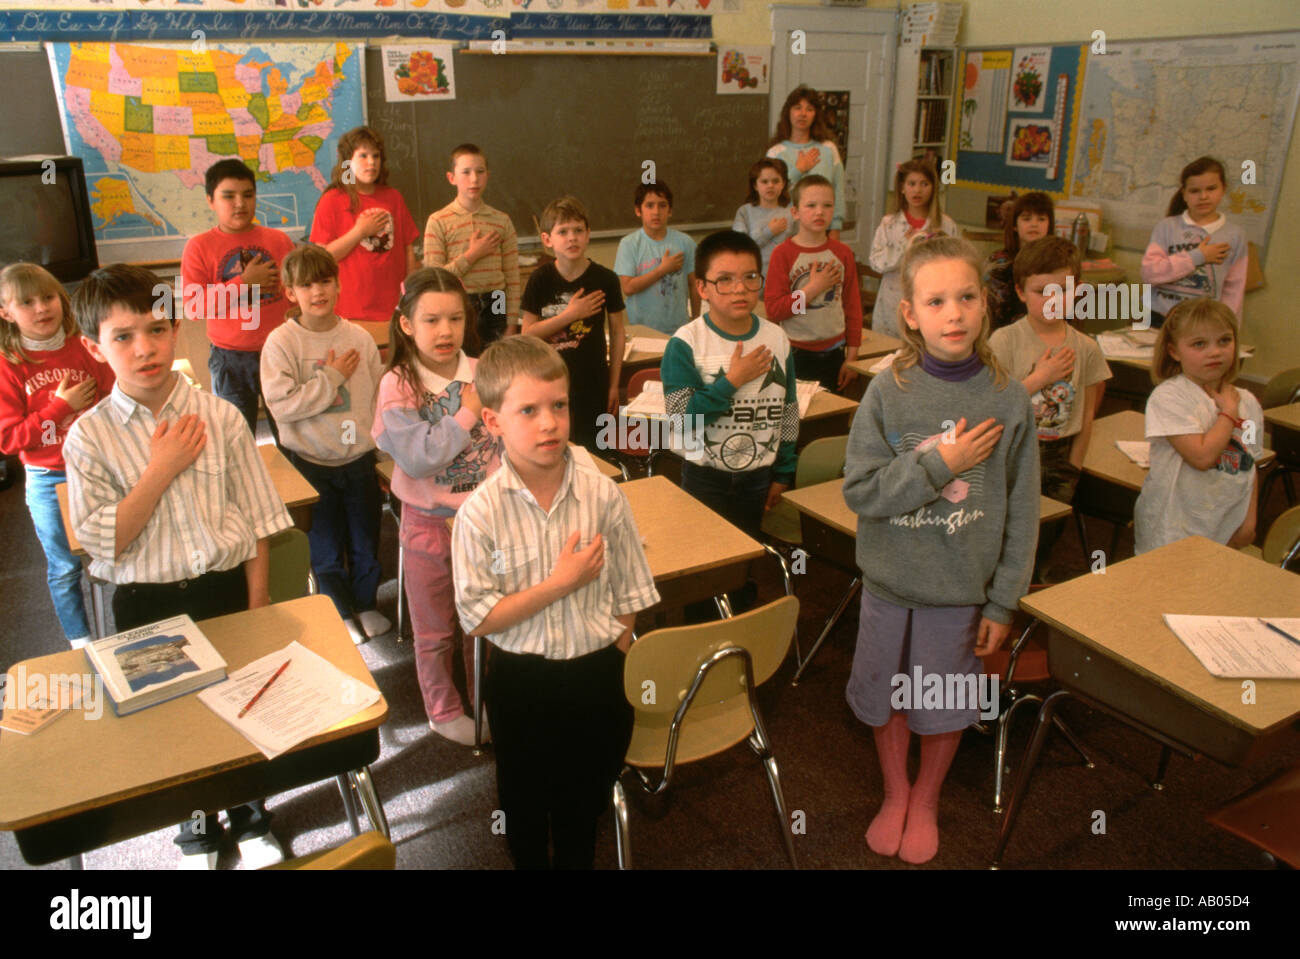 pledge of allegiance children stock photos u0026 pledge of allegiance